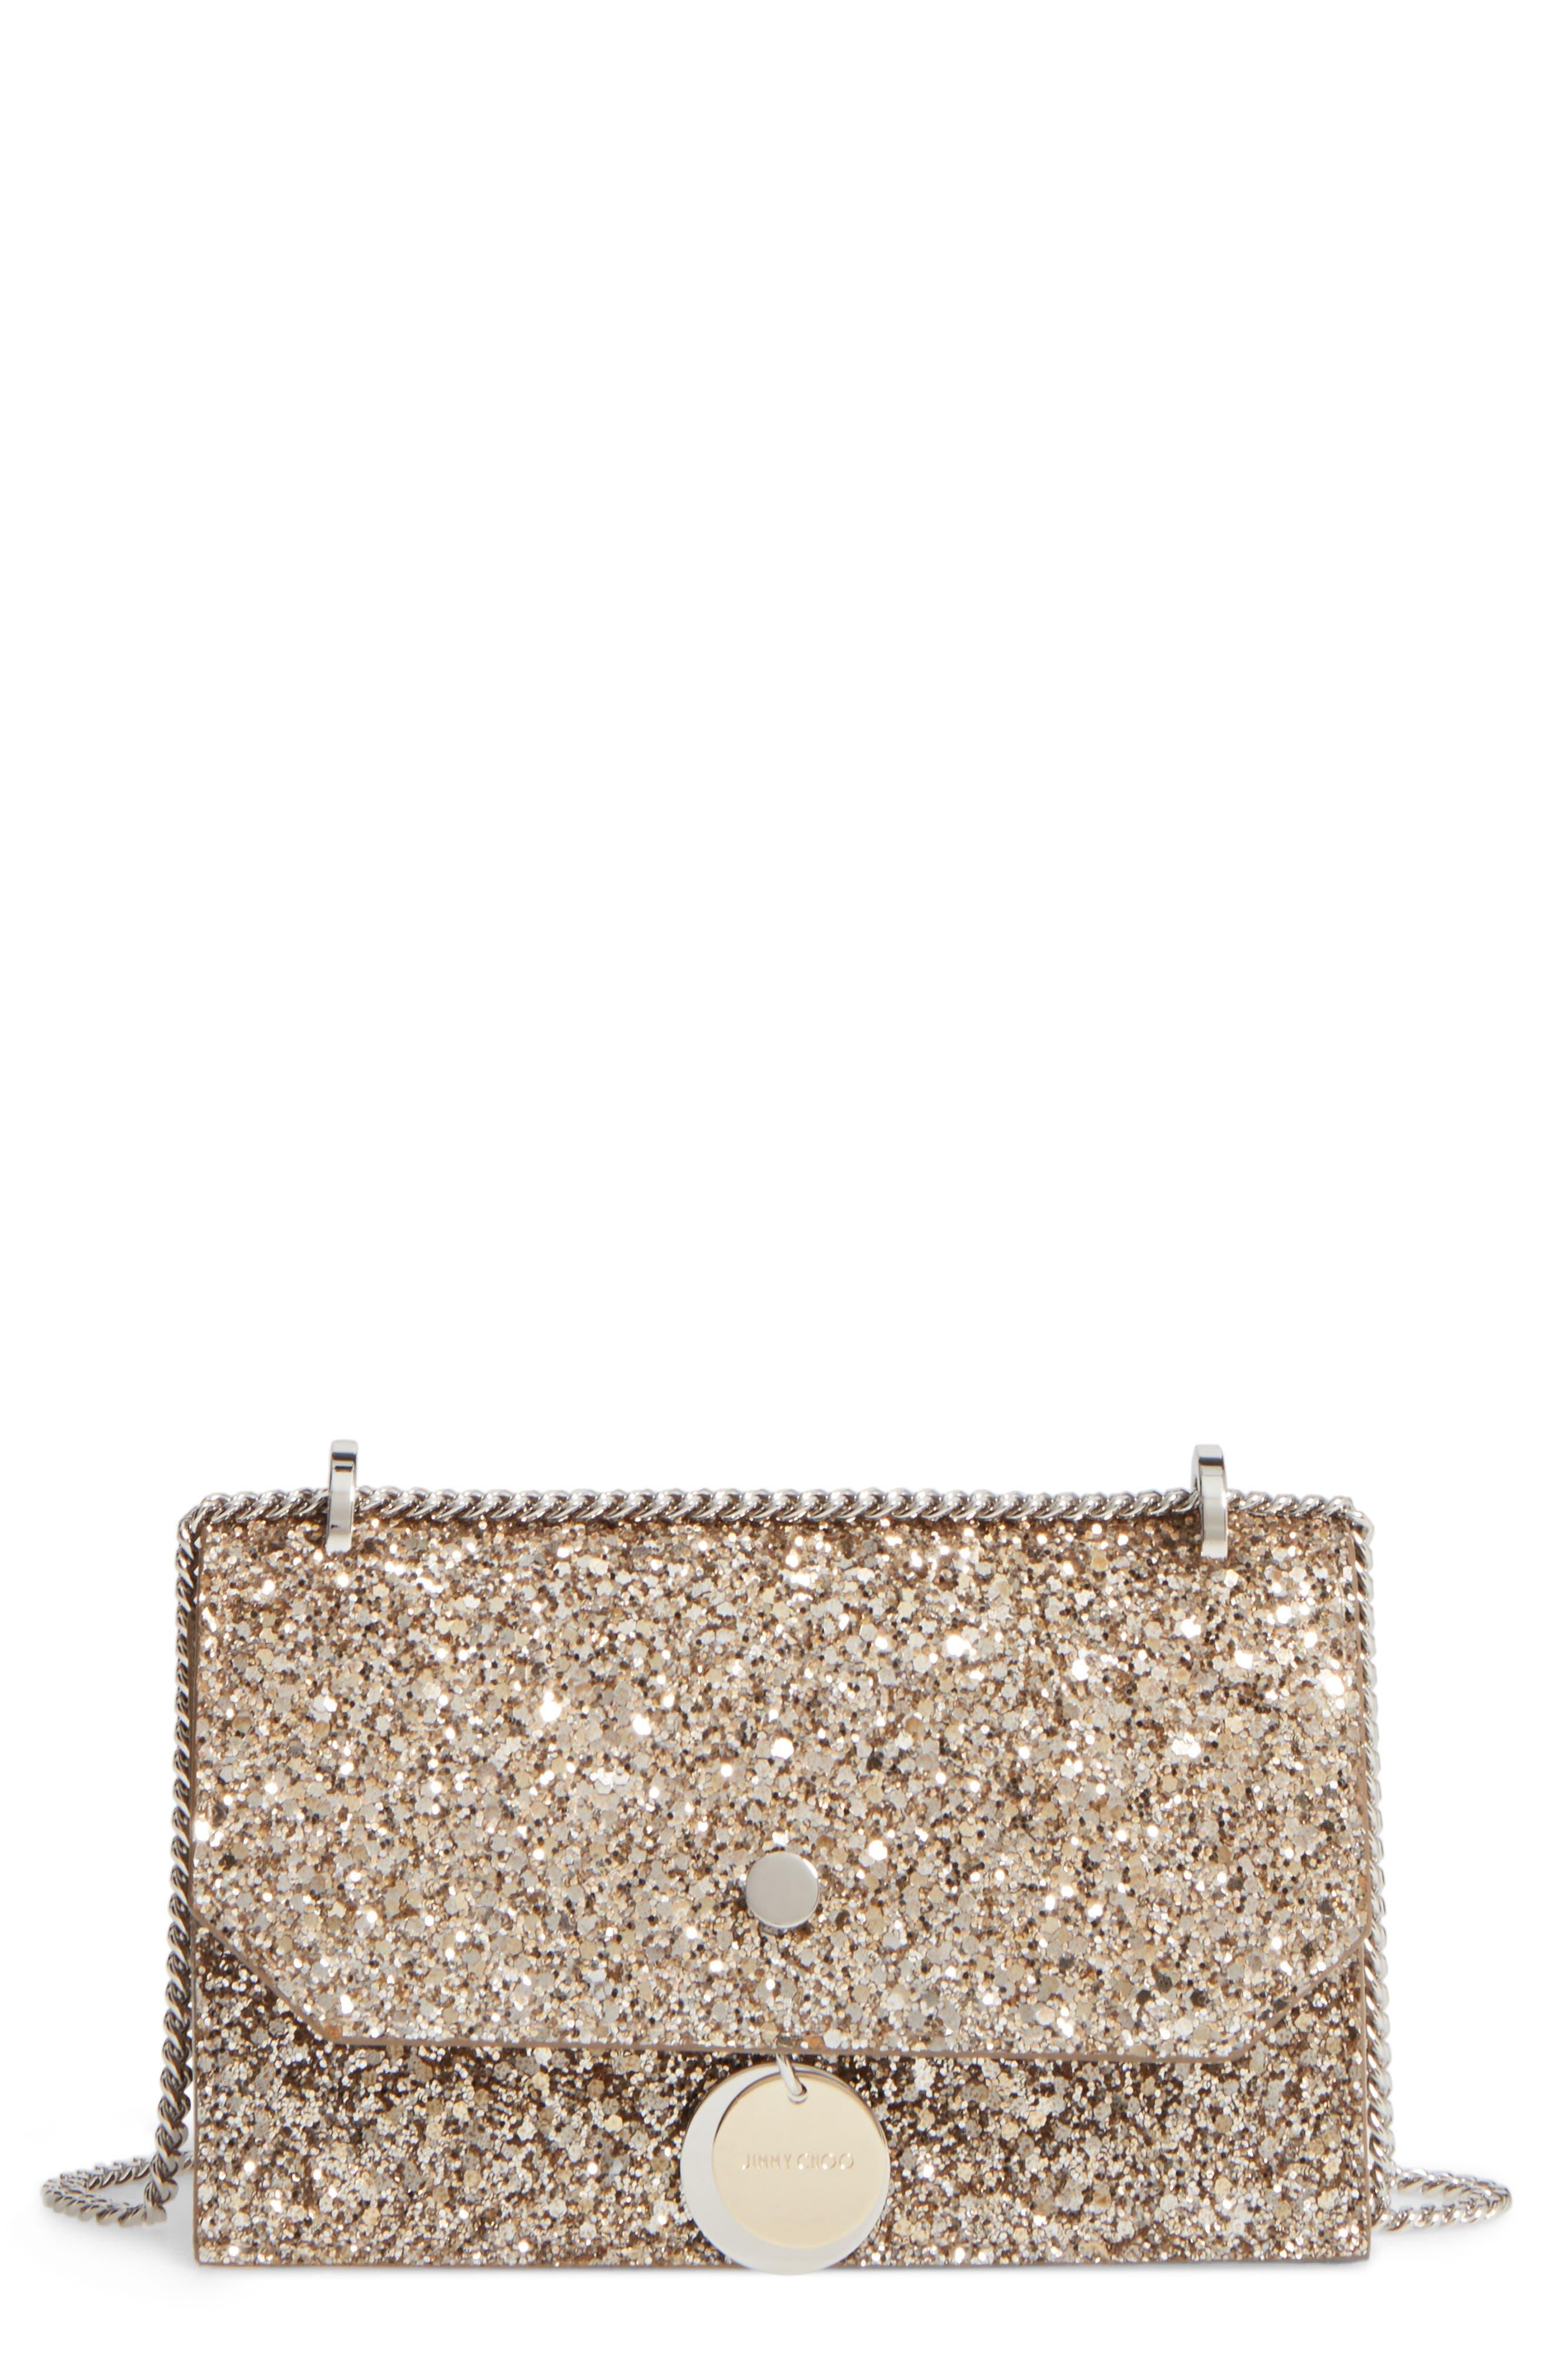 Finley Shadow Glitter Shoulder Bag,                             Main thumbnail 1, color,                             710